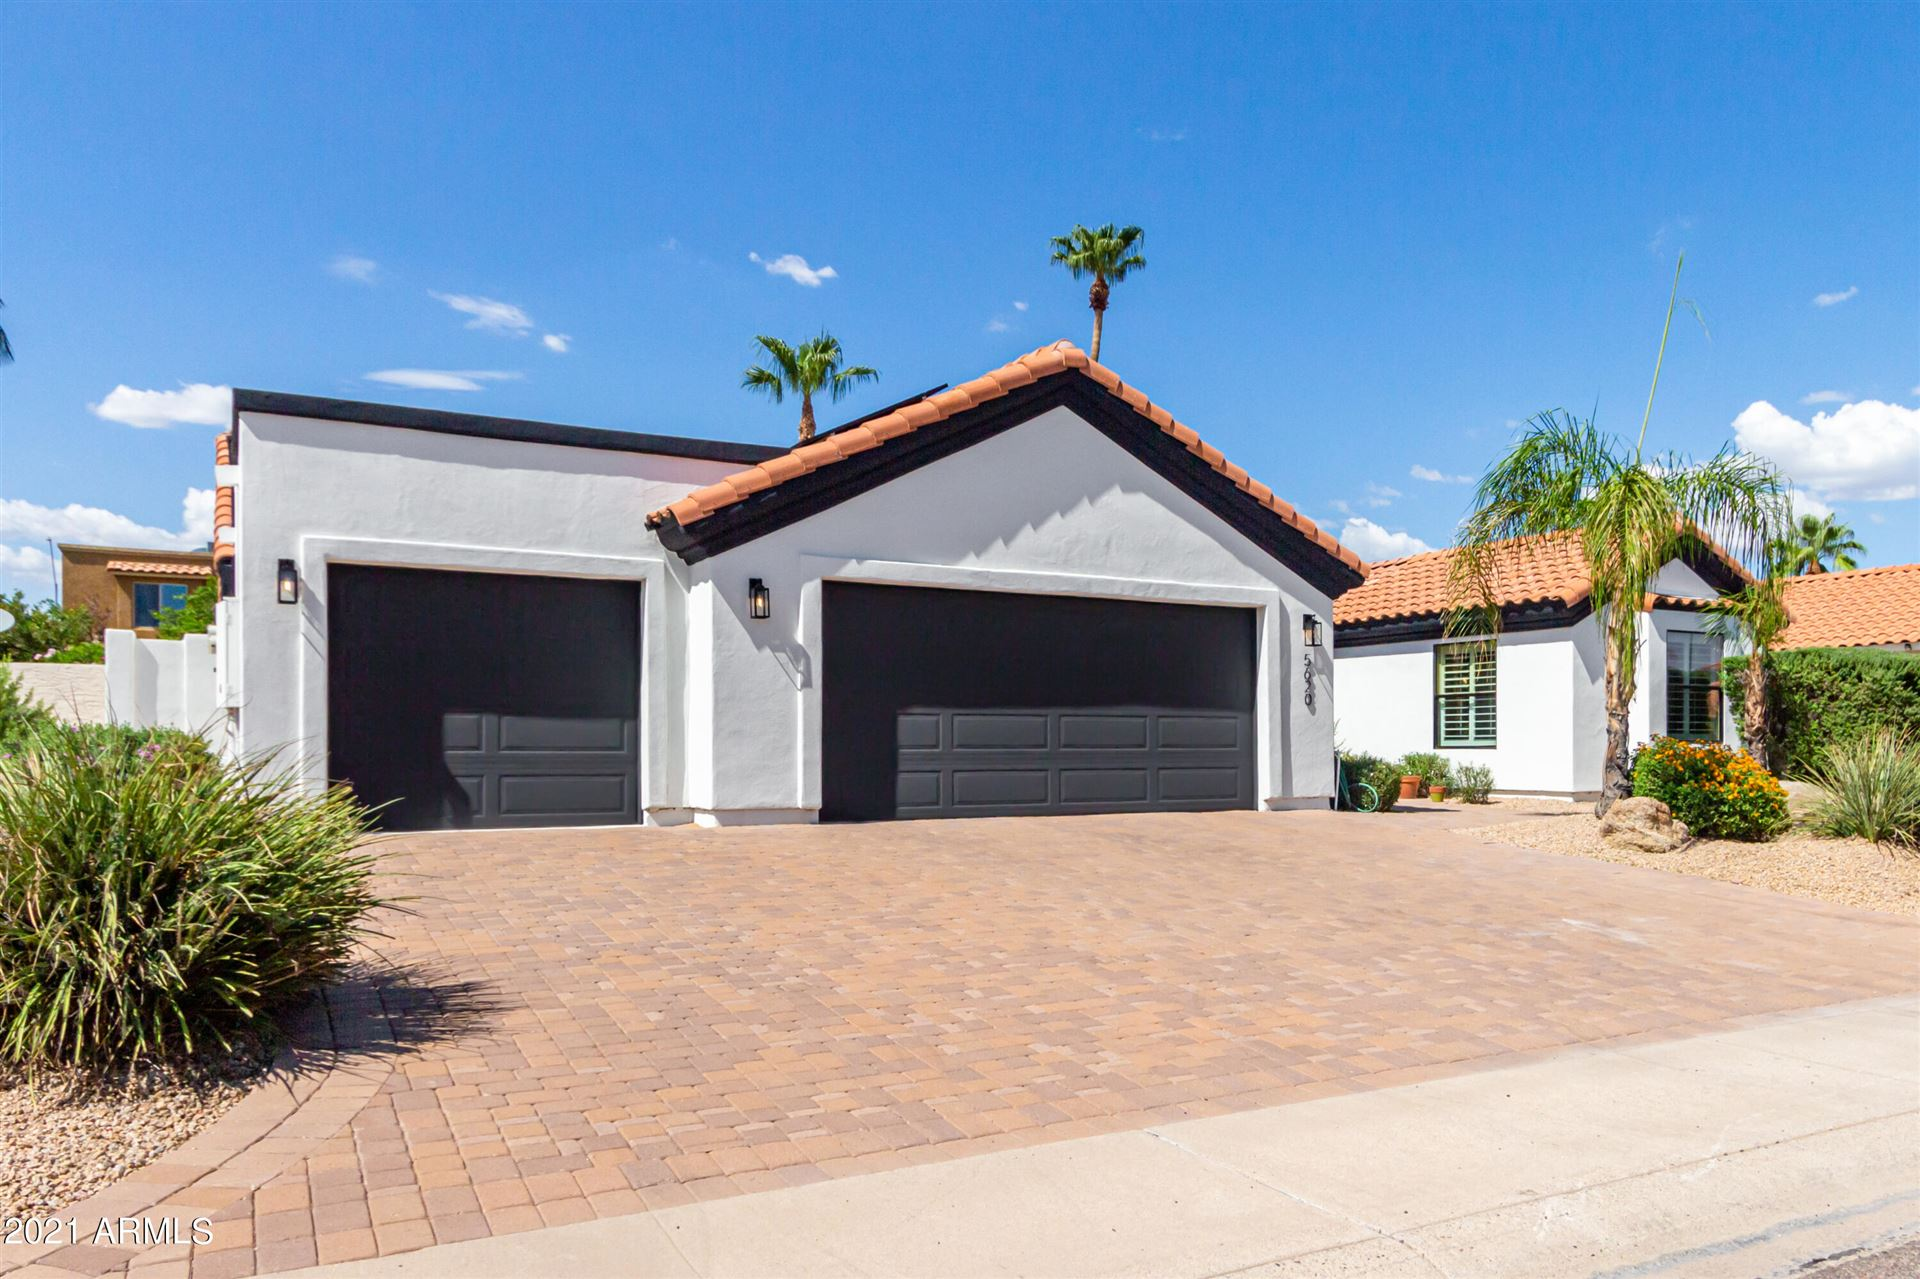 Photo of 5620 E LE MARCHE Avenue, Scottsdale, AZ 85254 (MLS # 6269780)